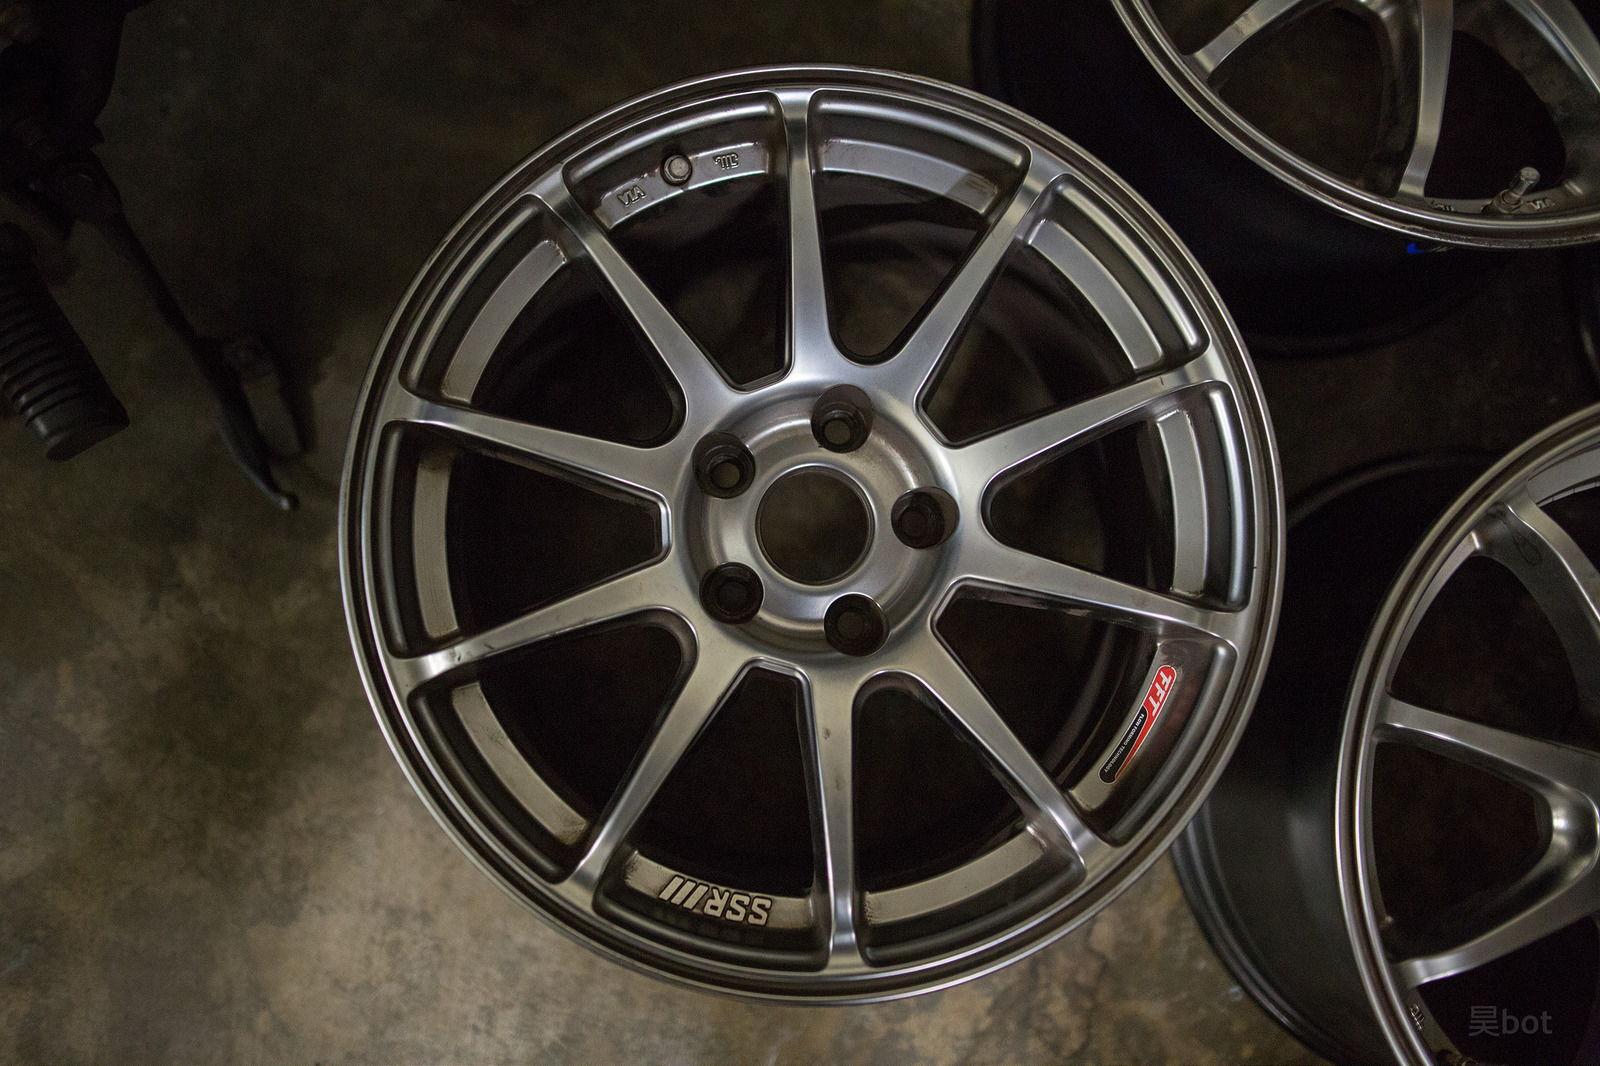 FS: SSR GTV02 silver 17x9 45mm offset 80-31569574252_832d52fea5_h_a86485fb719b07c1665f6738ed8666b0930c193c